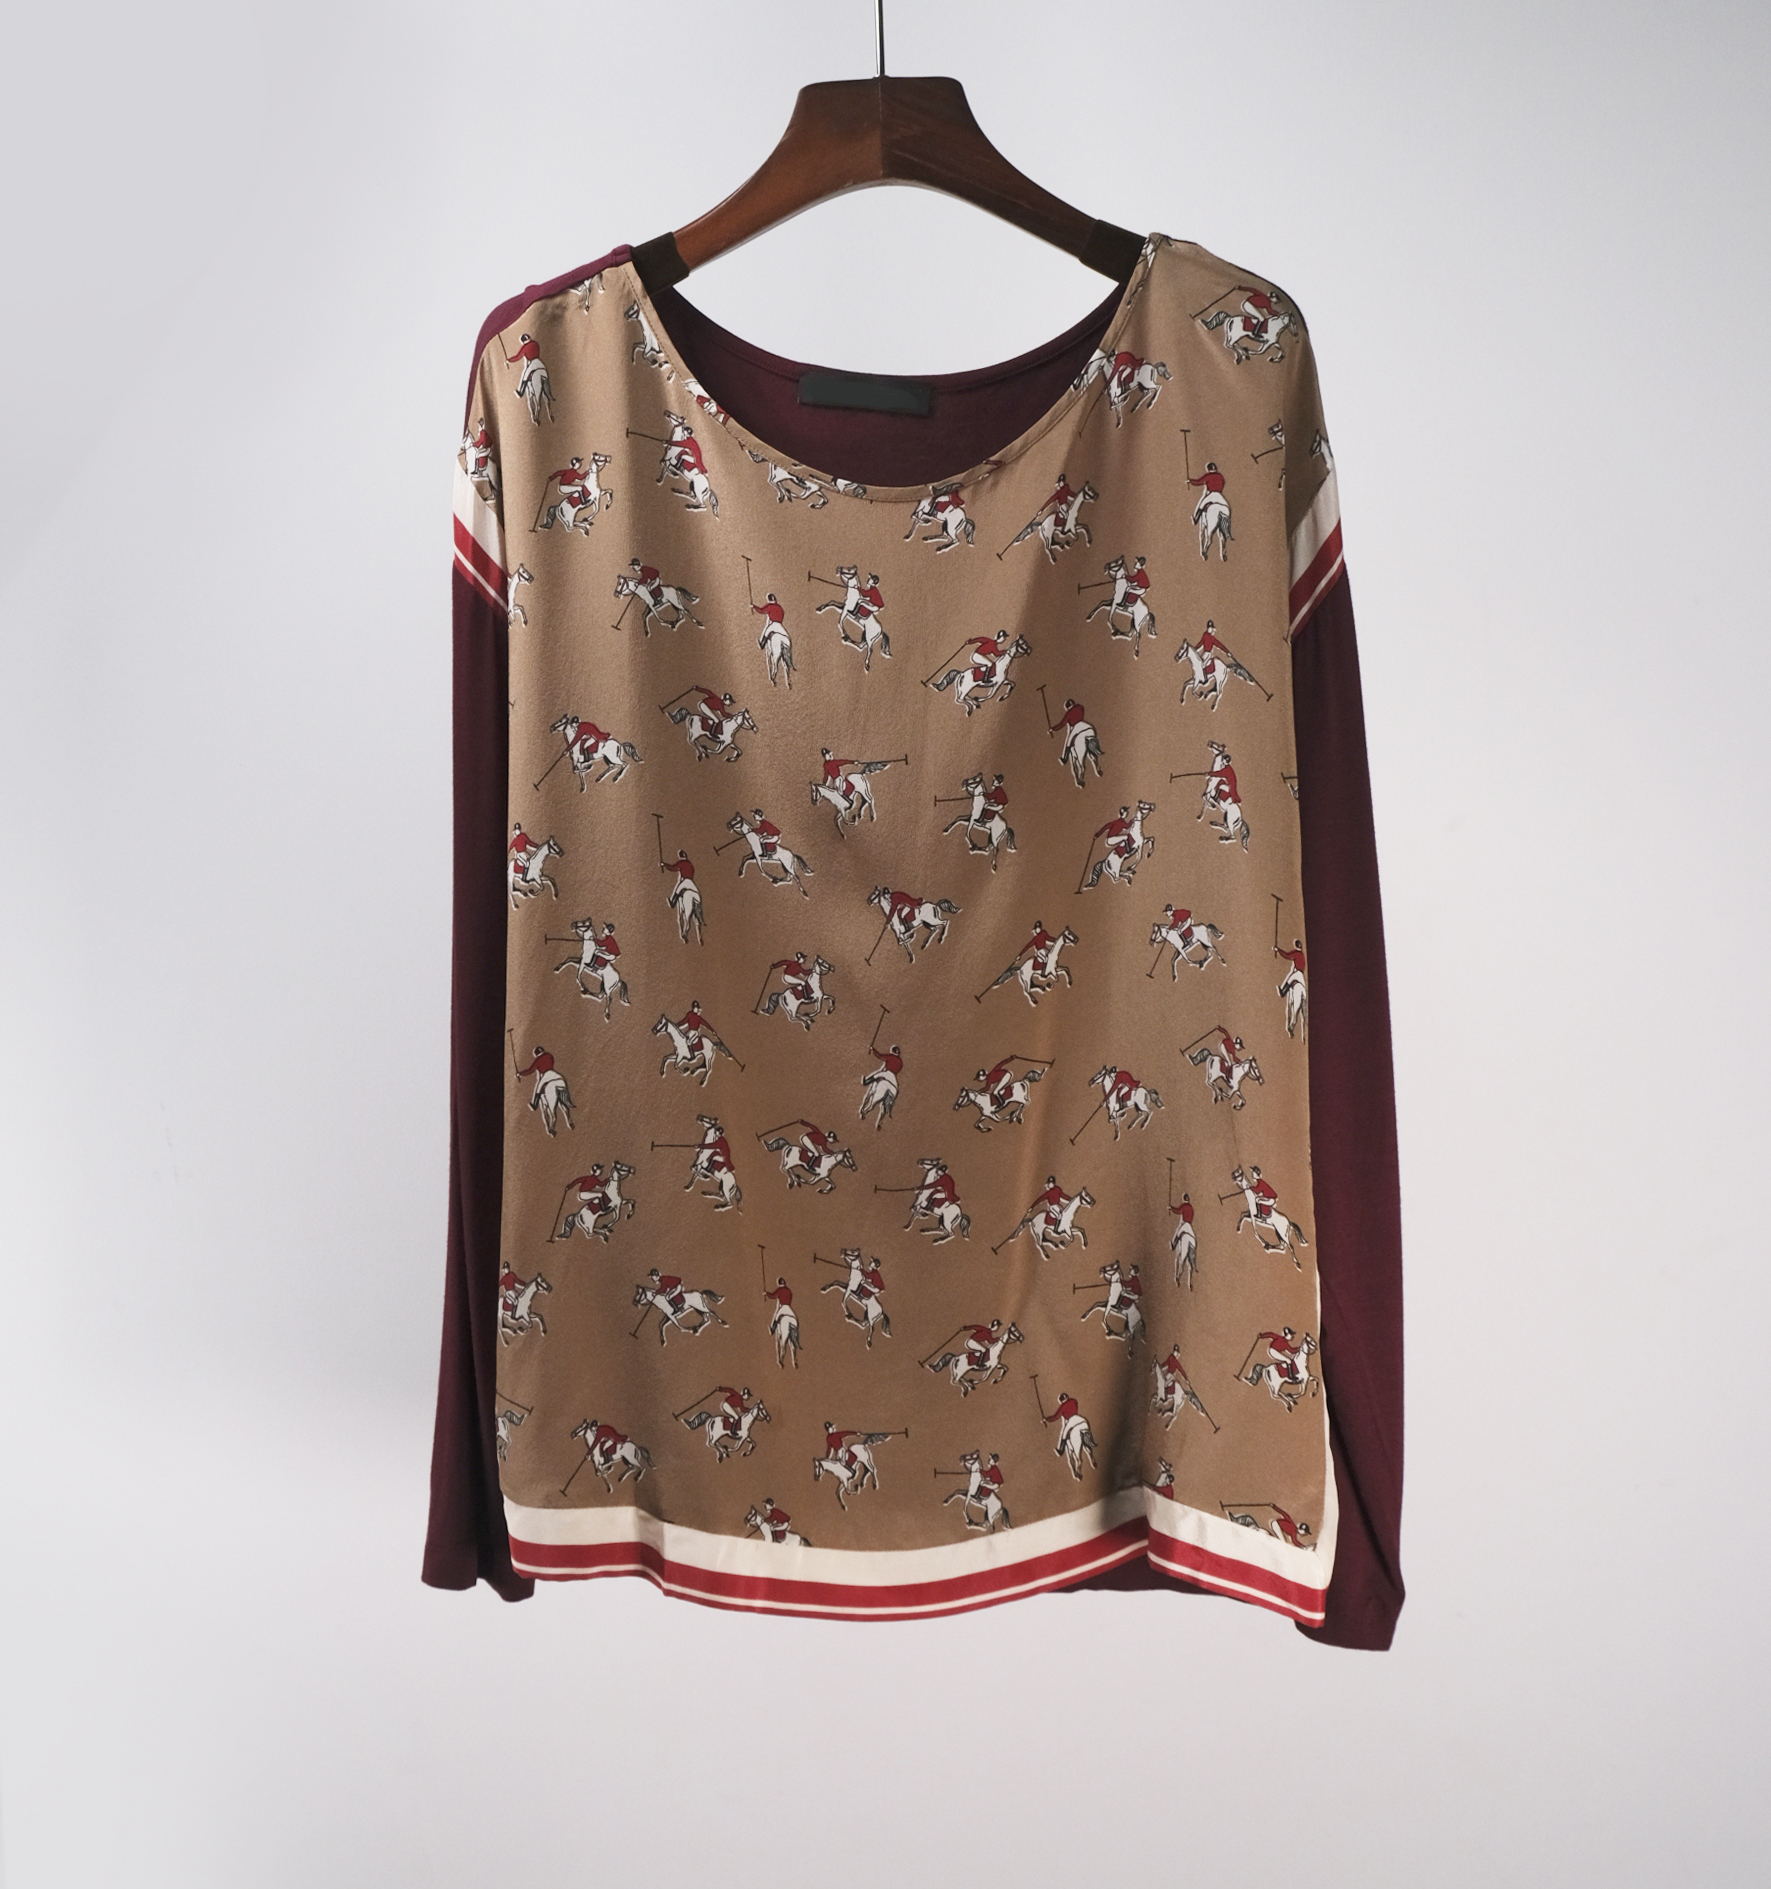 Italian era leisure Polo pattern silk print autumn long sleeve loose T-shirt round neck top